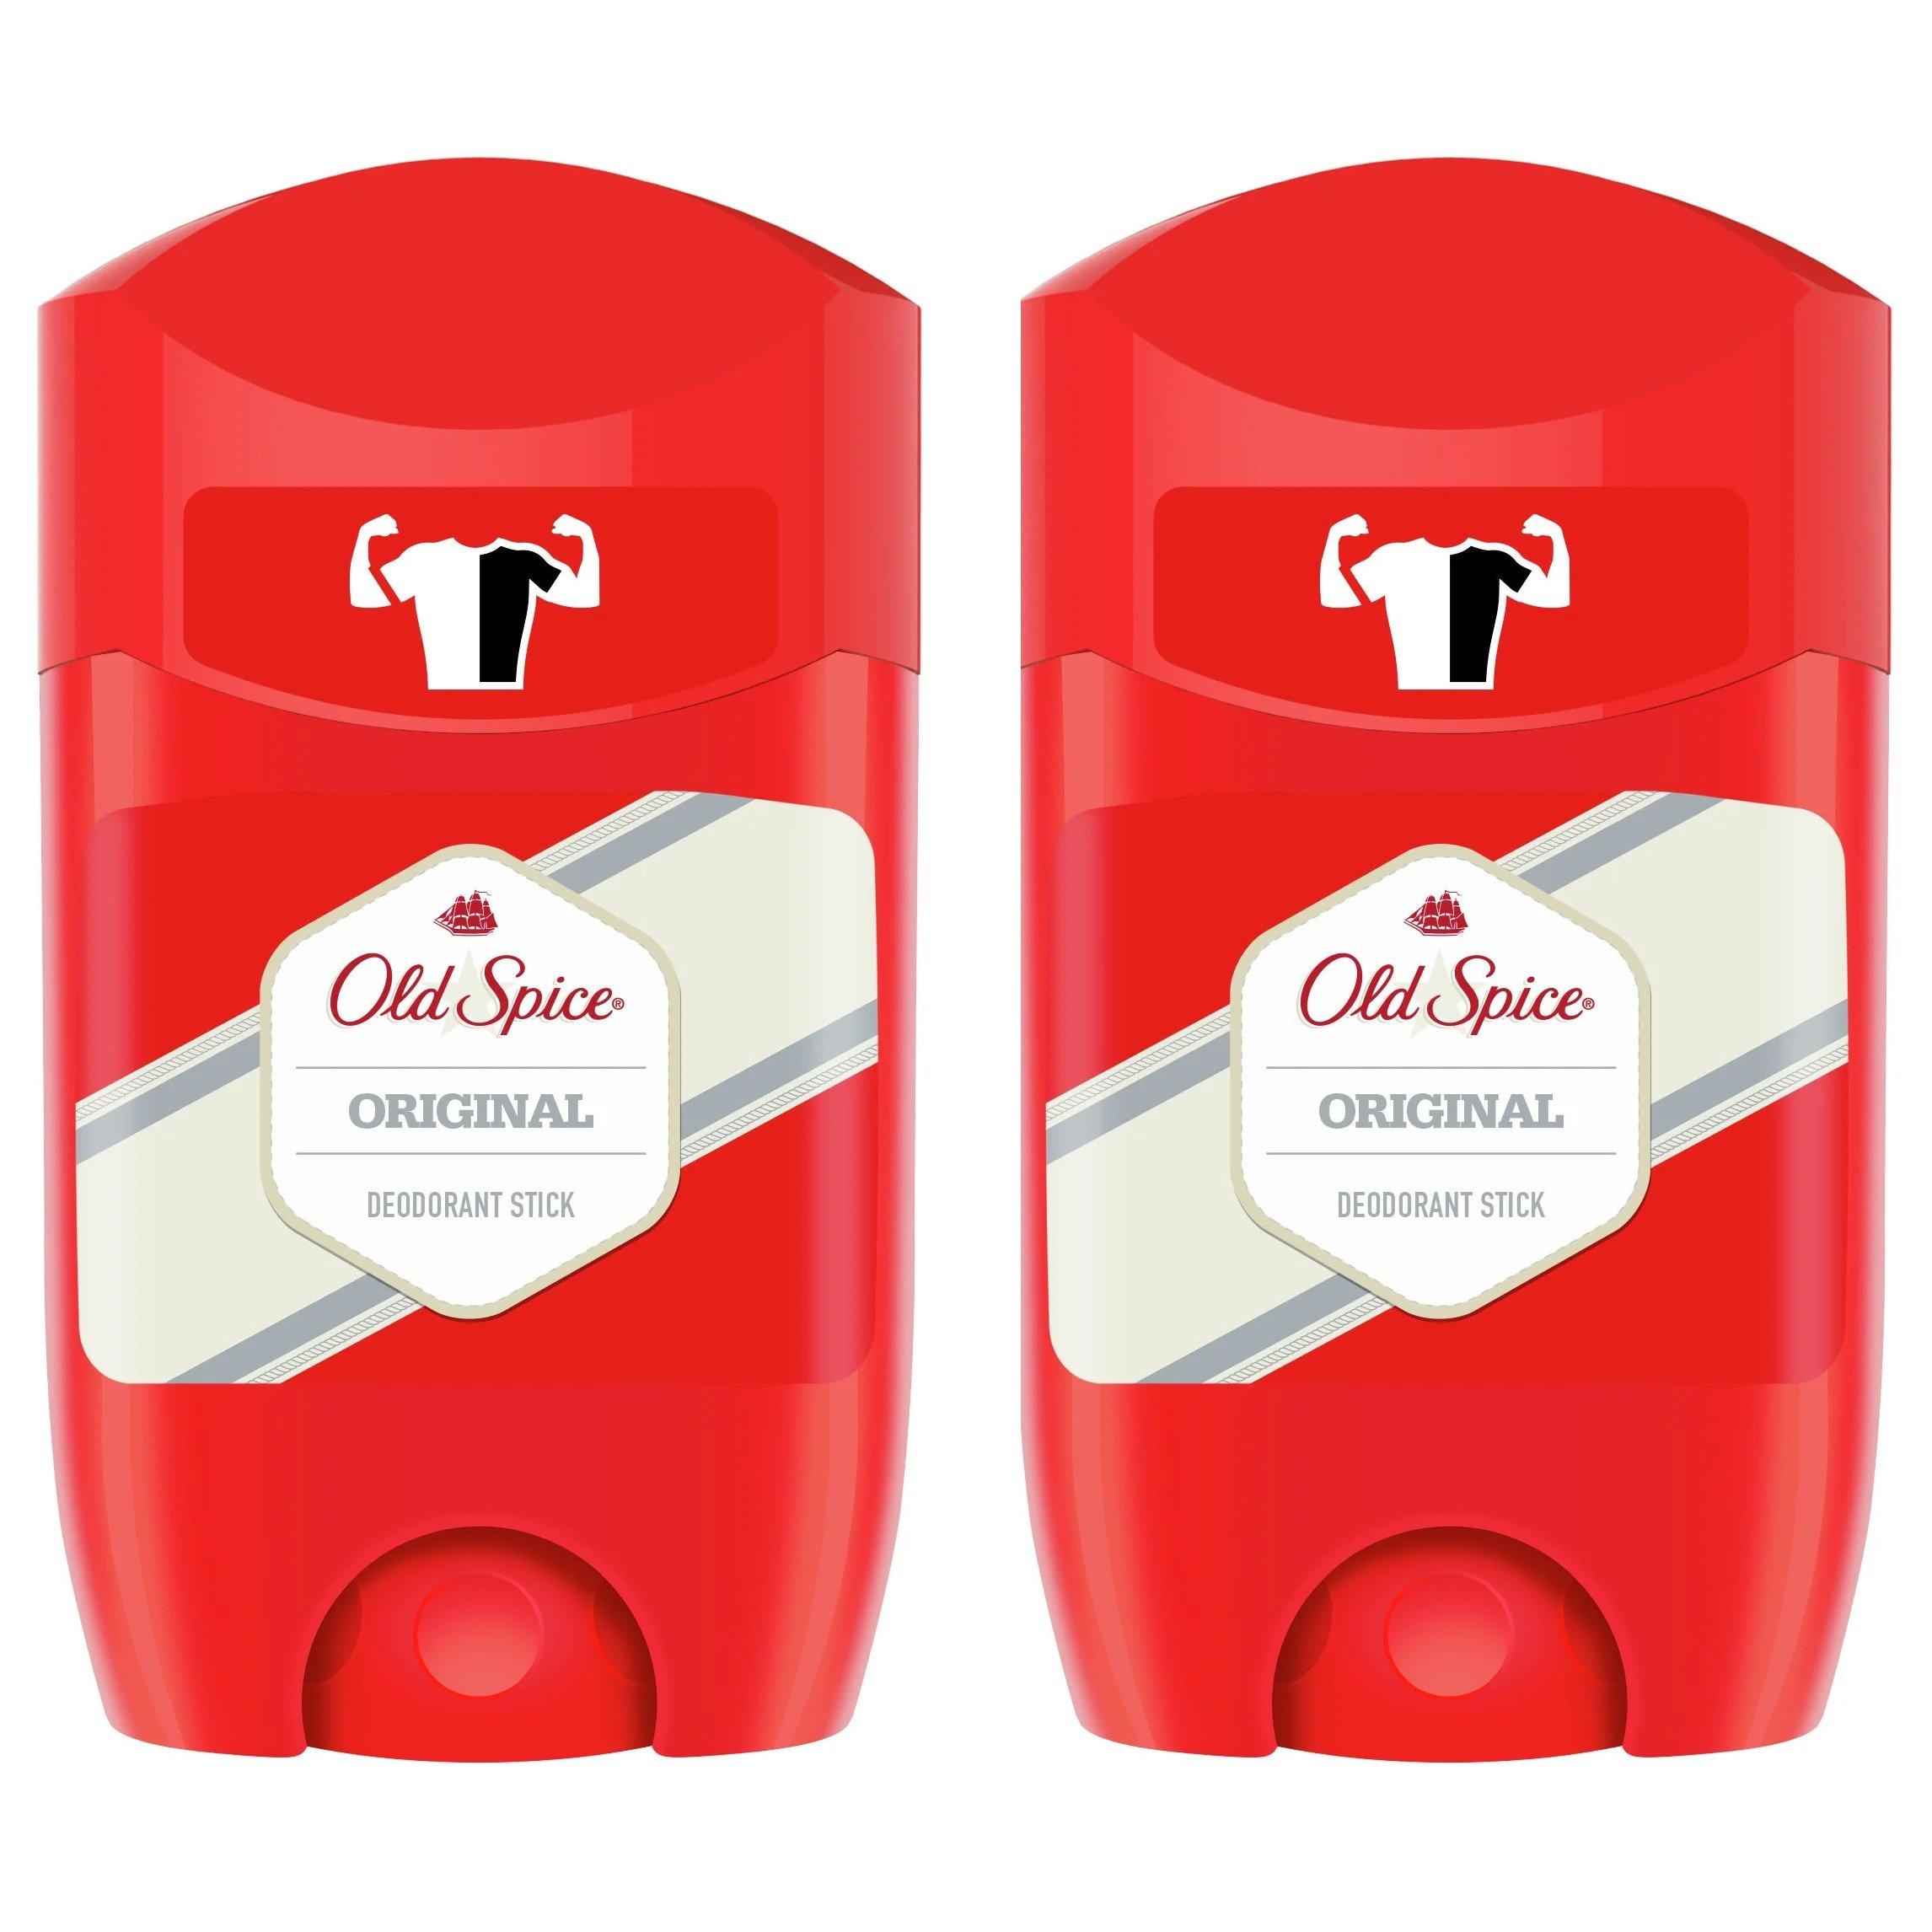 Old Spice Πακέτο Προσφοράς Original Deodorant Stick Αποσμητικό με Αναζωογονητικό και Αρρενωπό Άρωμα 2x50ml